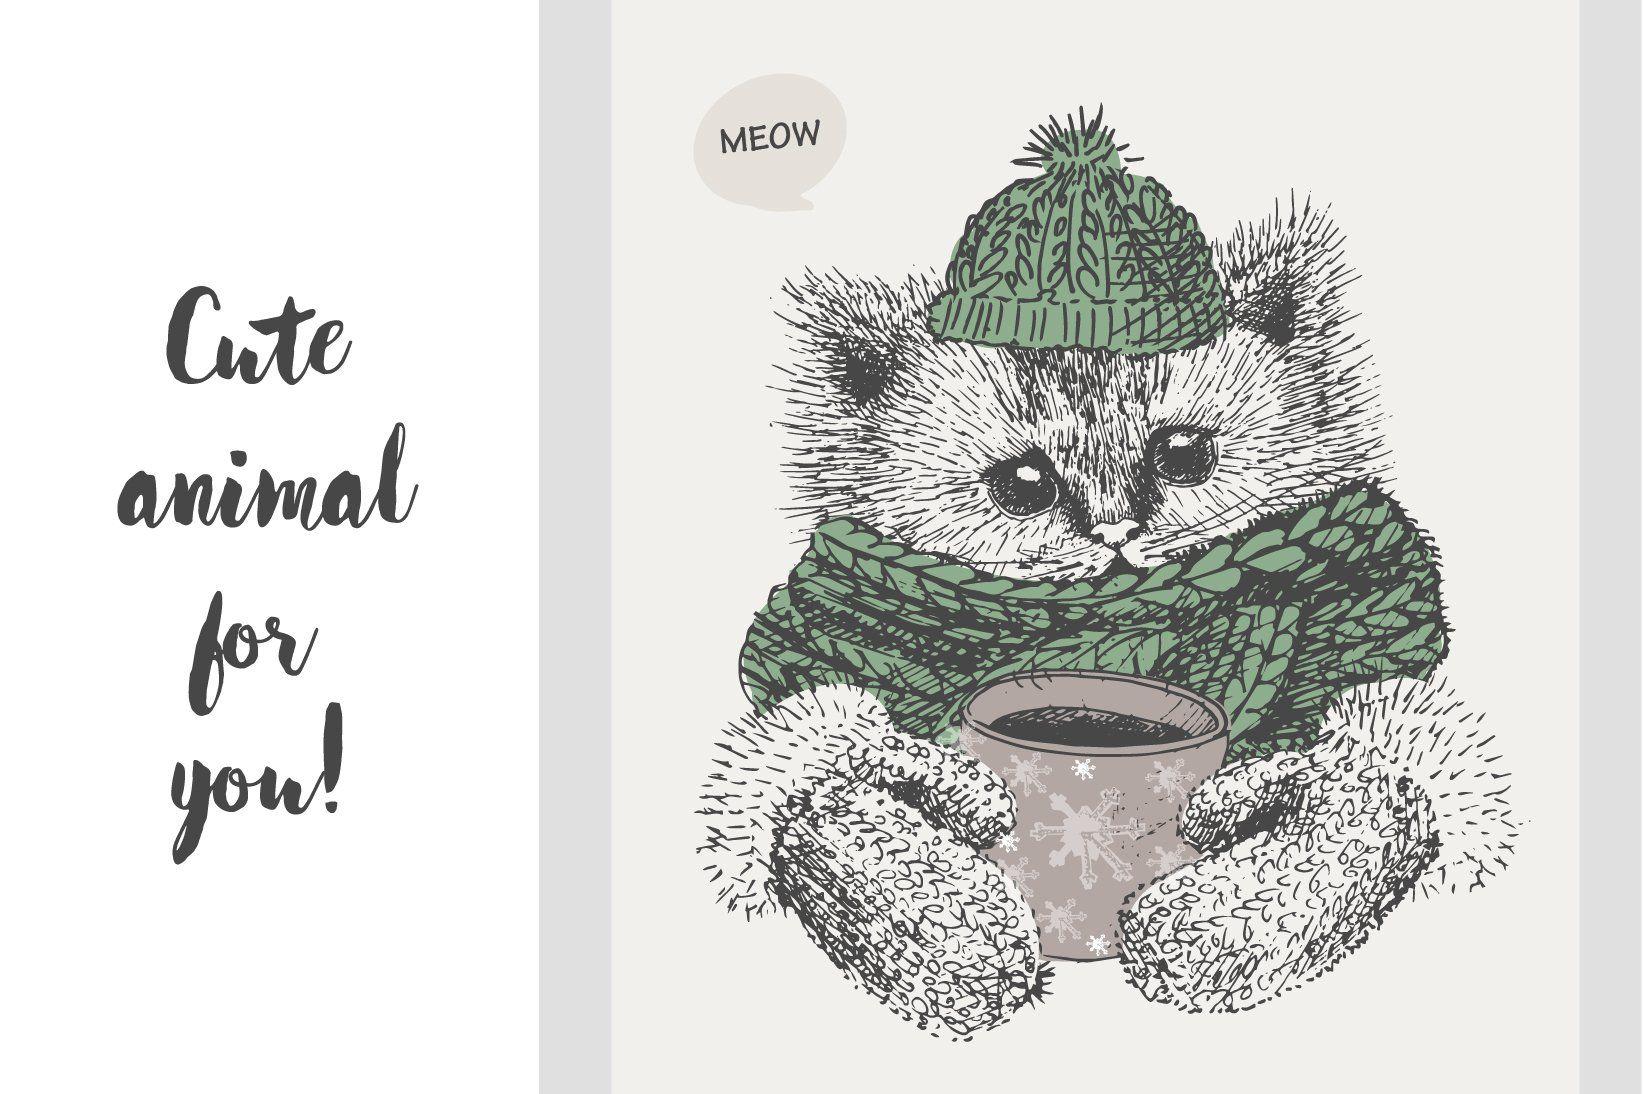 cute fluffy kitten , #AD, #file #Ad #fluffykittens